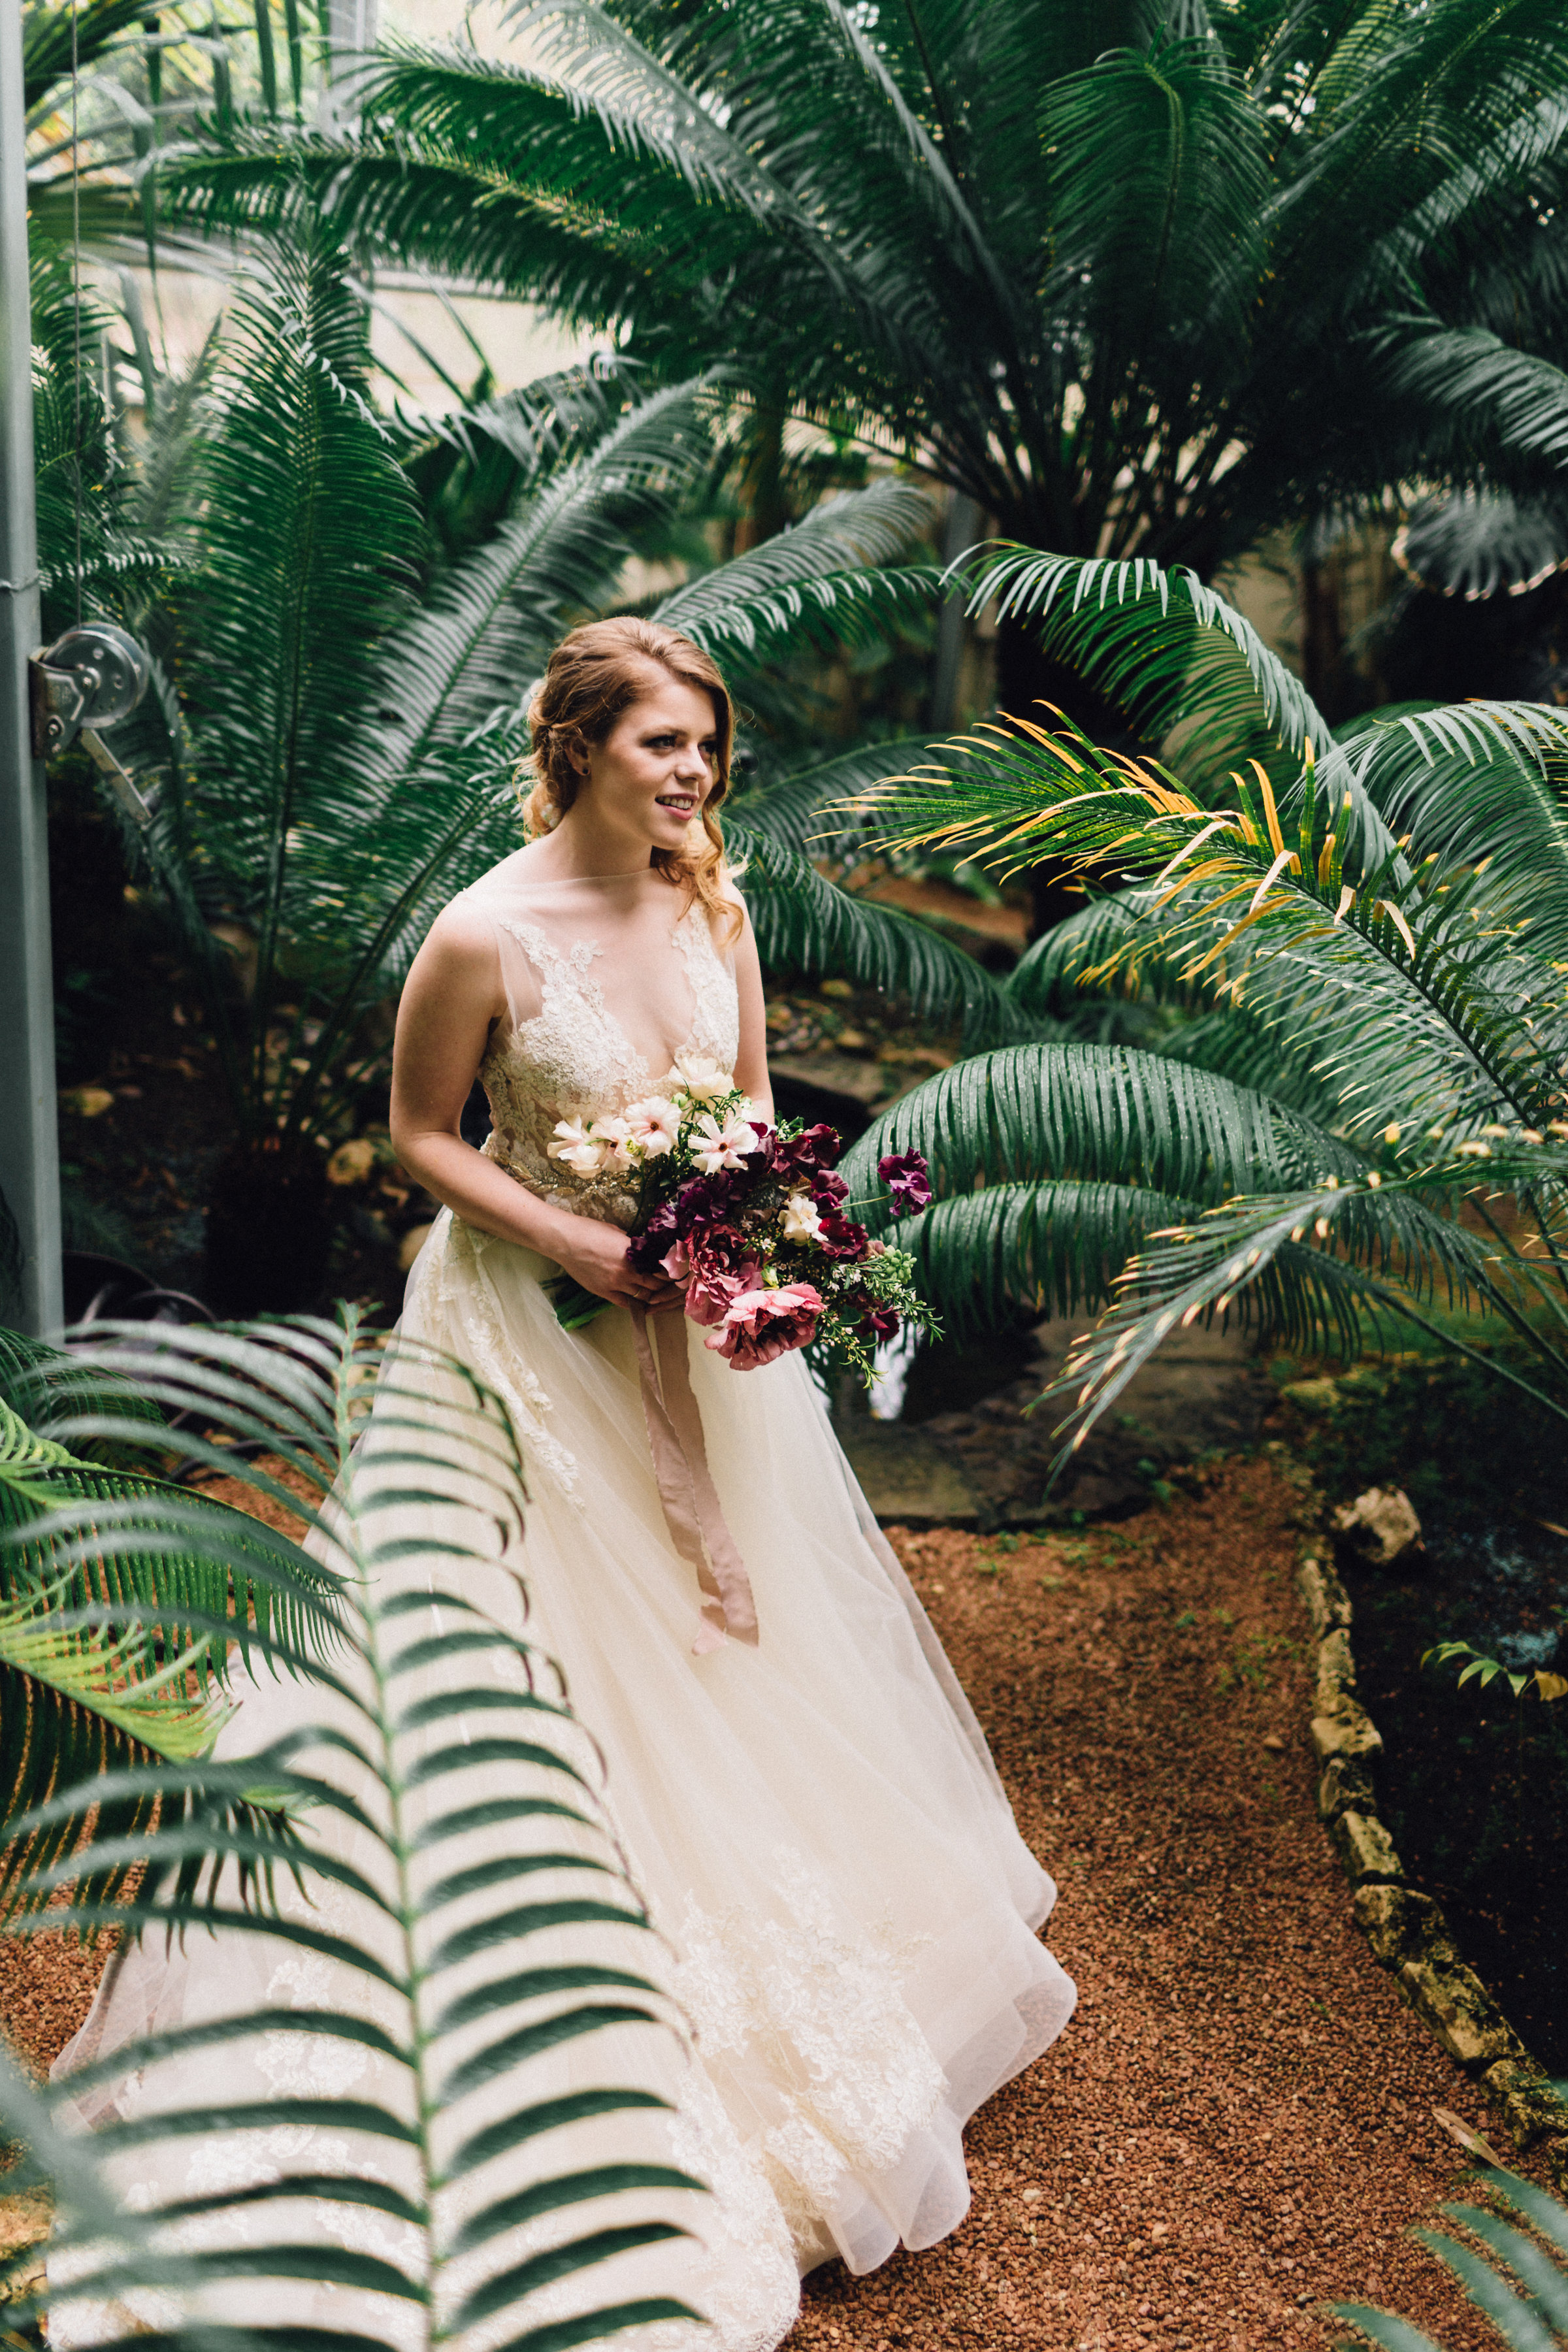 Rose_Bridals_Feather_&_Twine-102.jpg